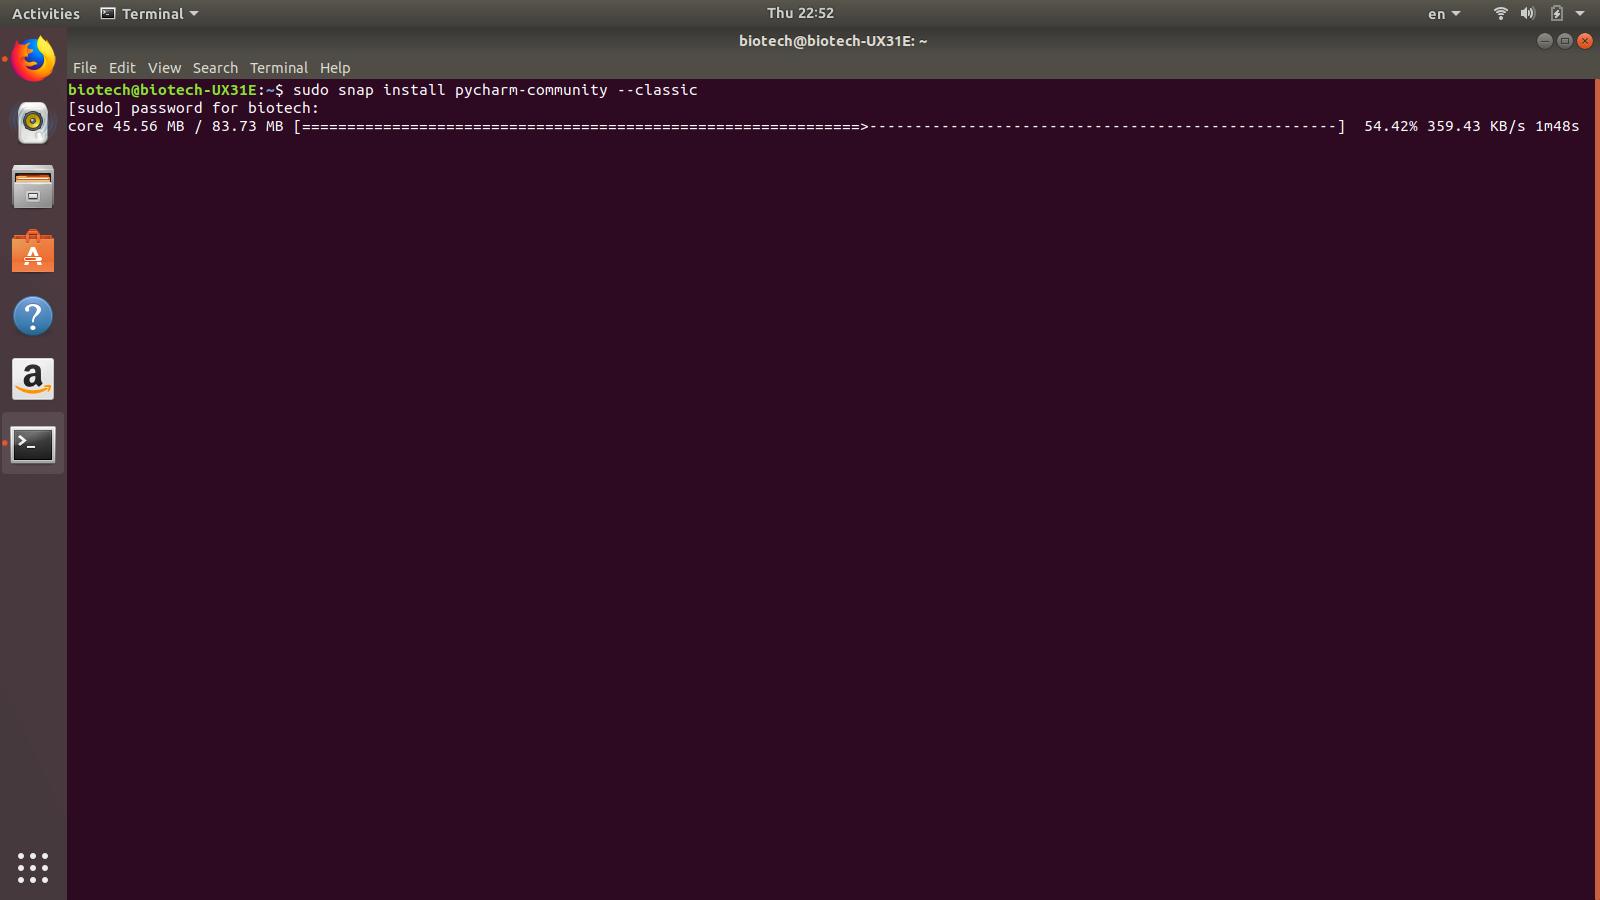 How to install program on Ubuntu: How to install PyCharm